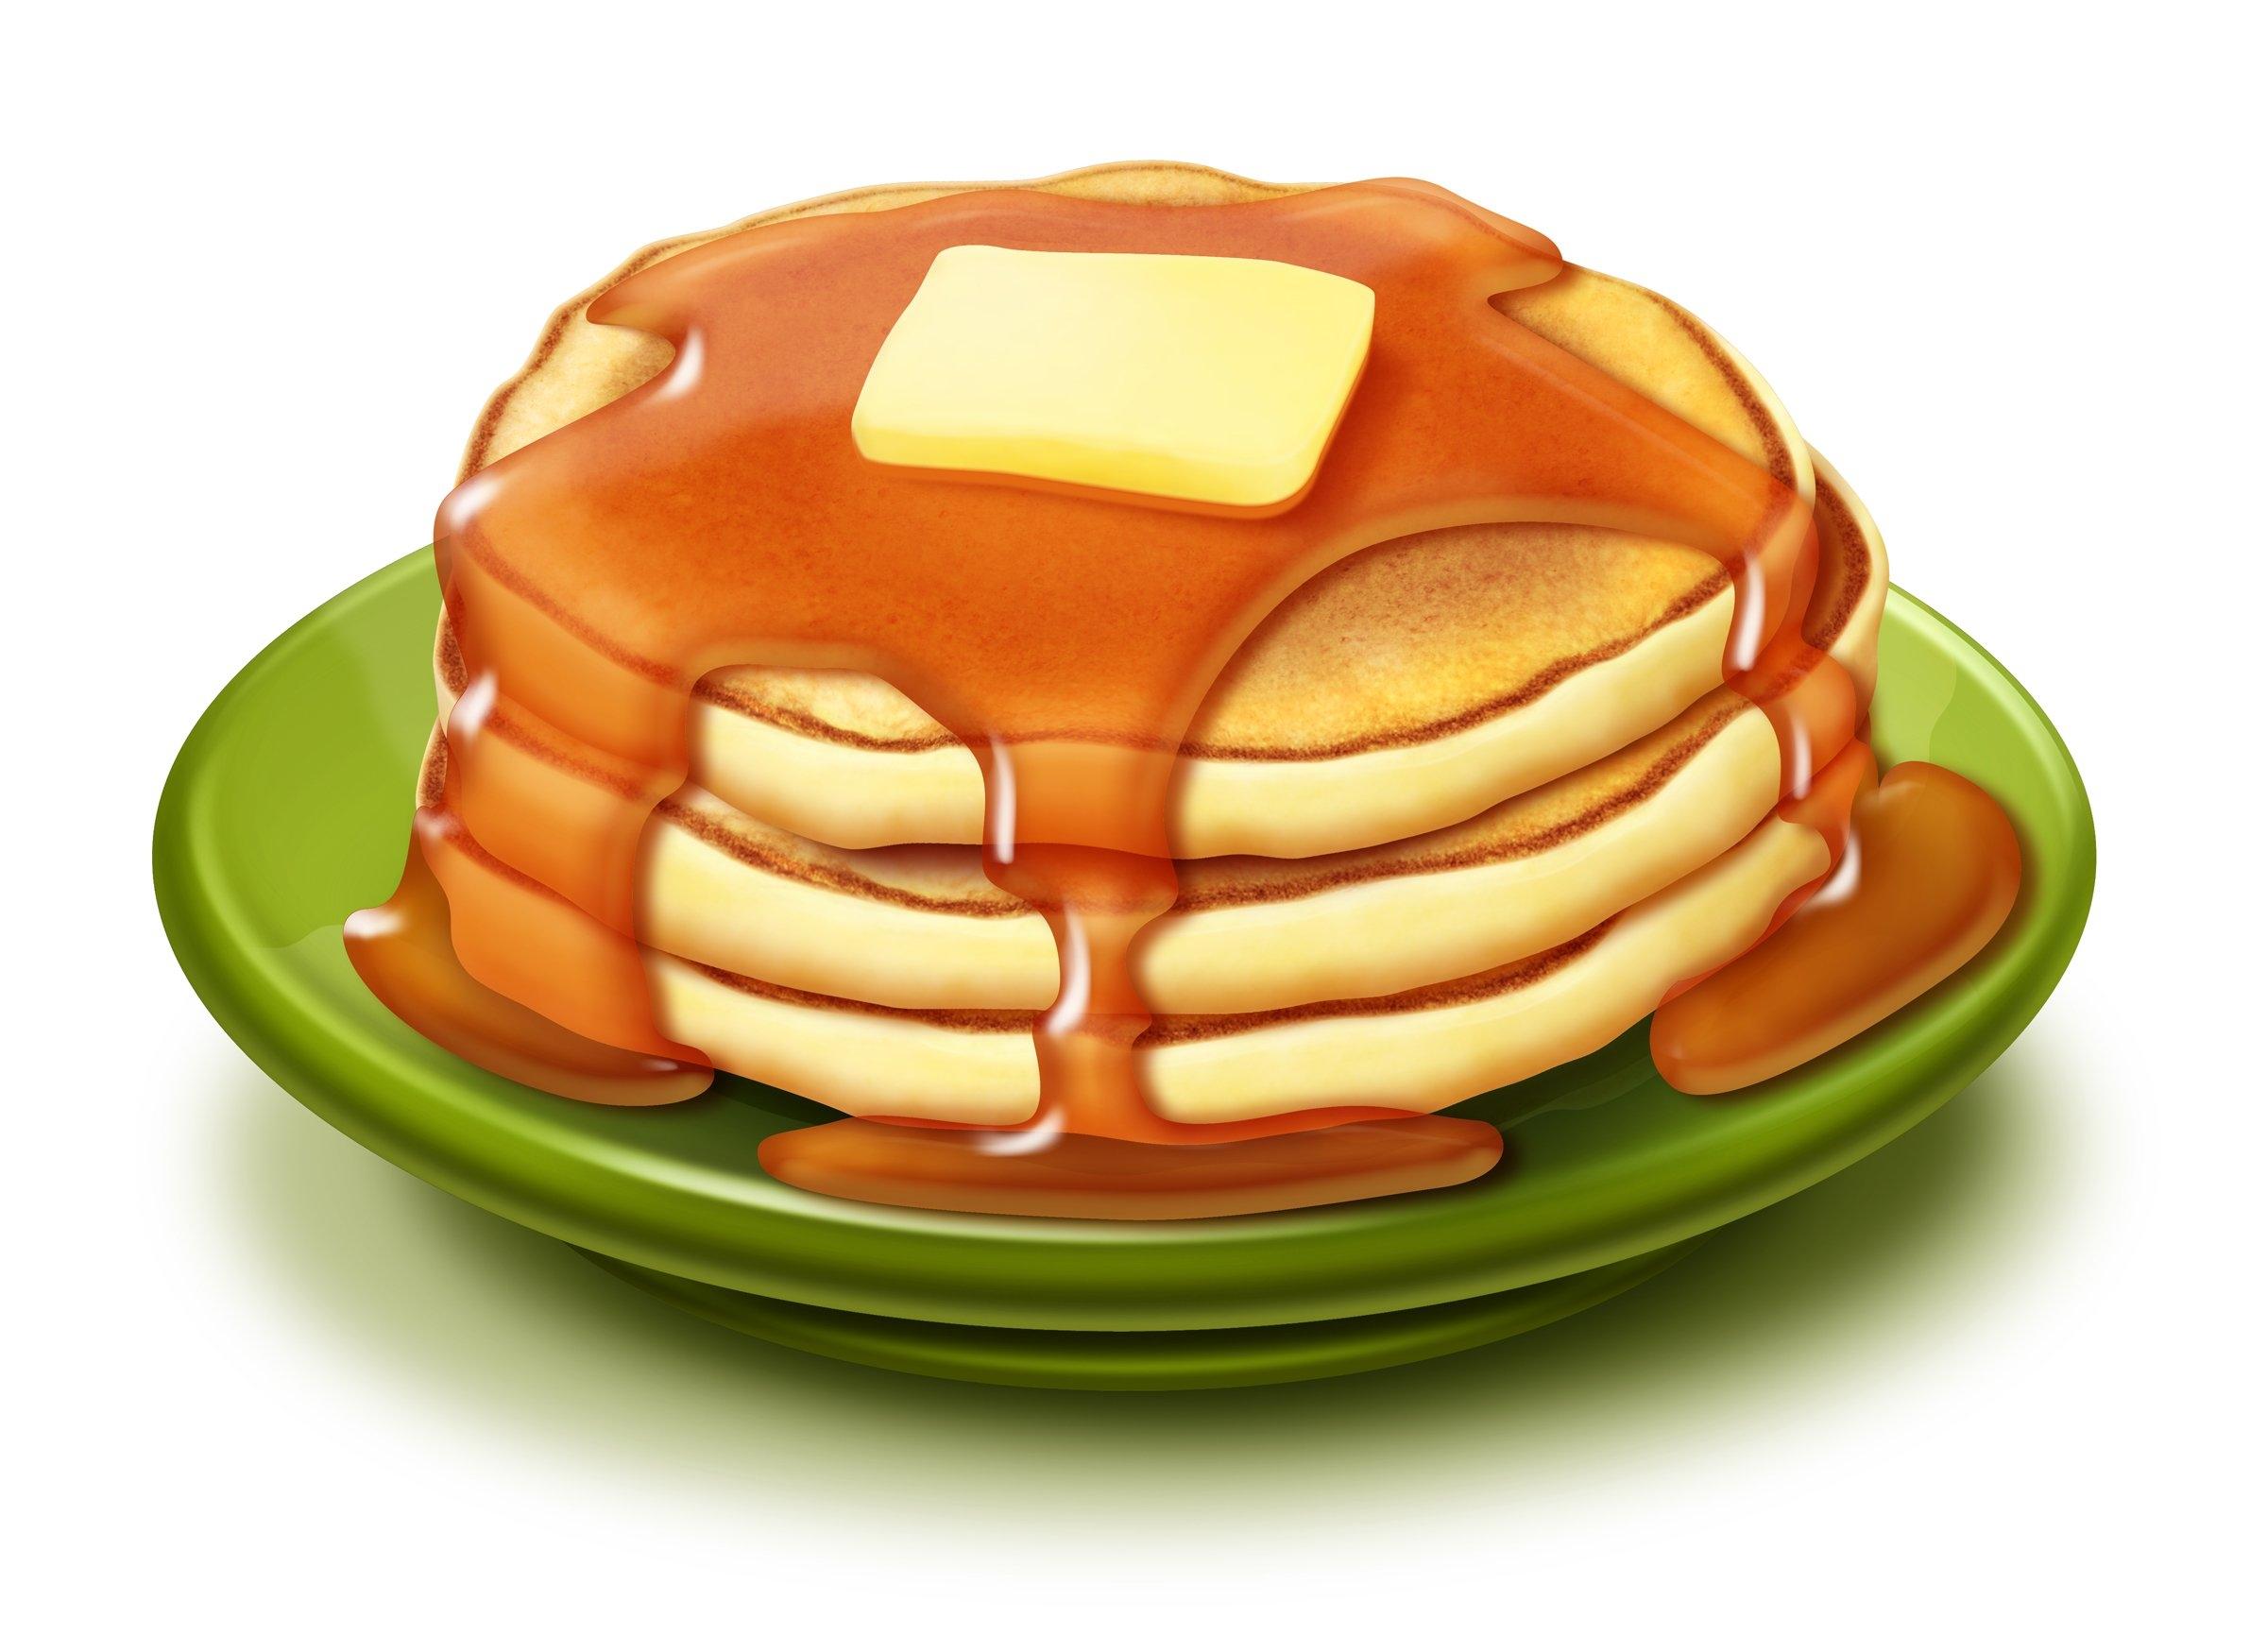 Pancake clipart Inspirational Pancake Clip Art Many.